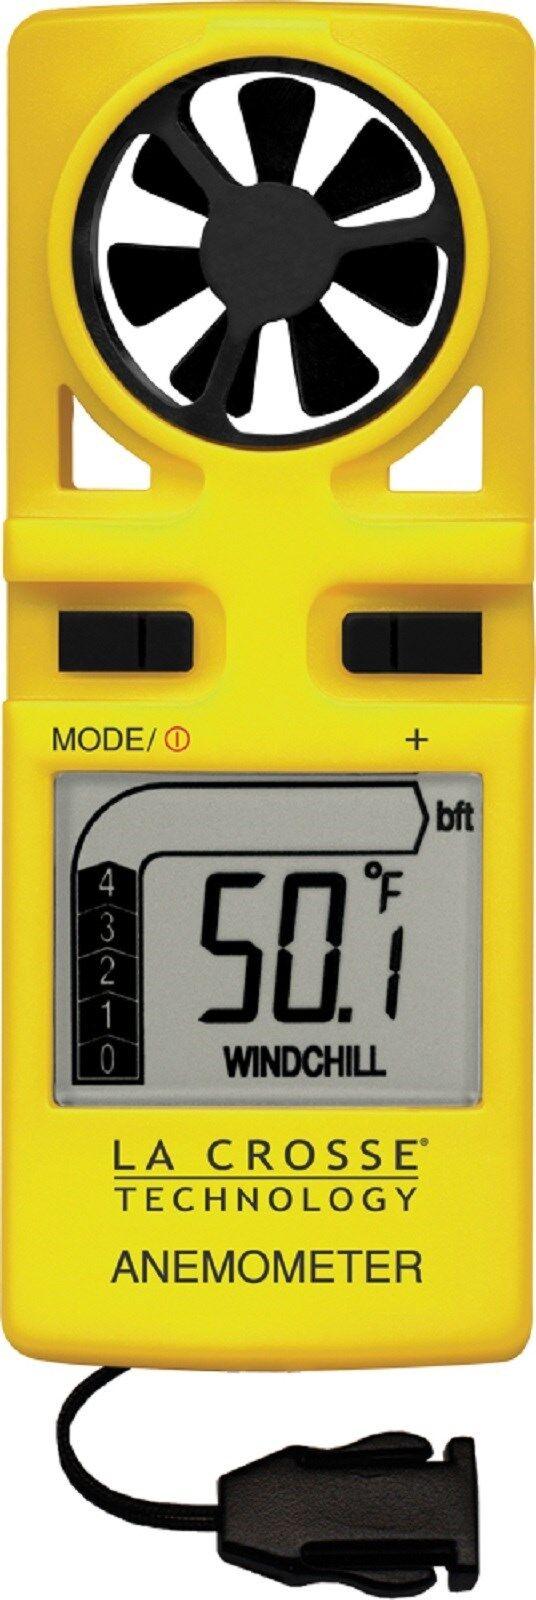 EA-3010U La Crosse Technology Handheld Anemometer with LED Backlight & Neck Band